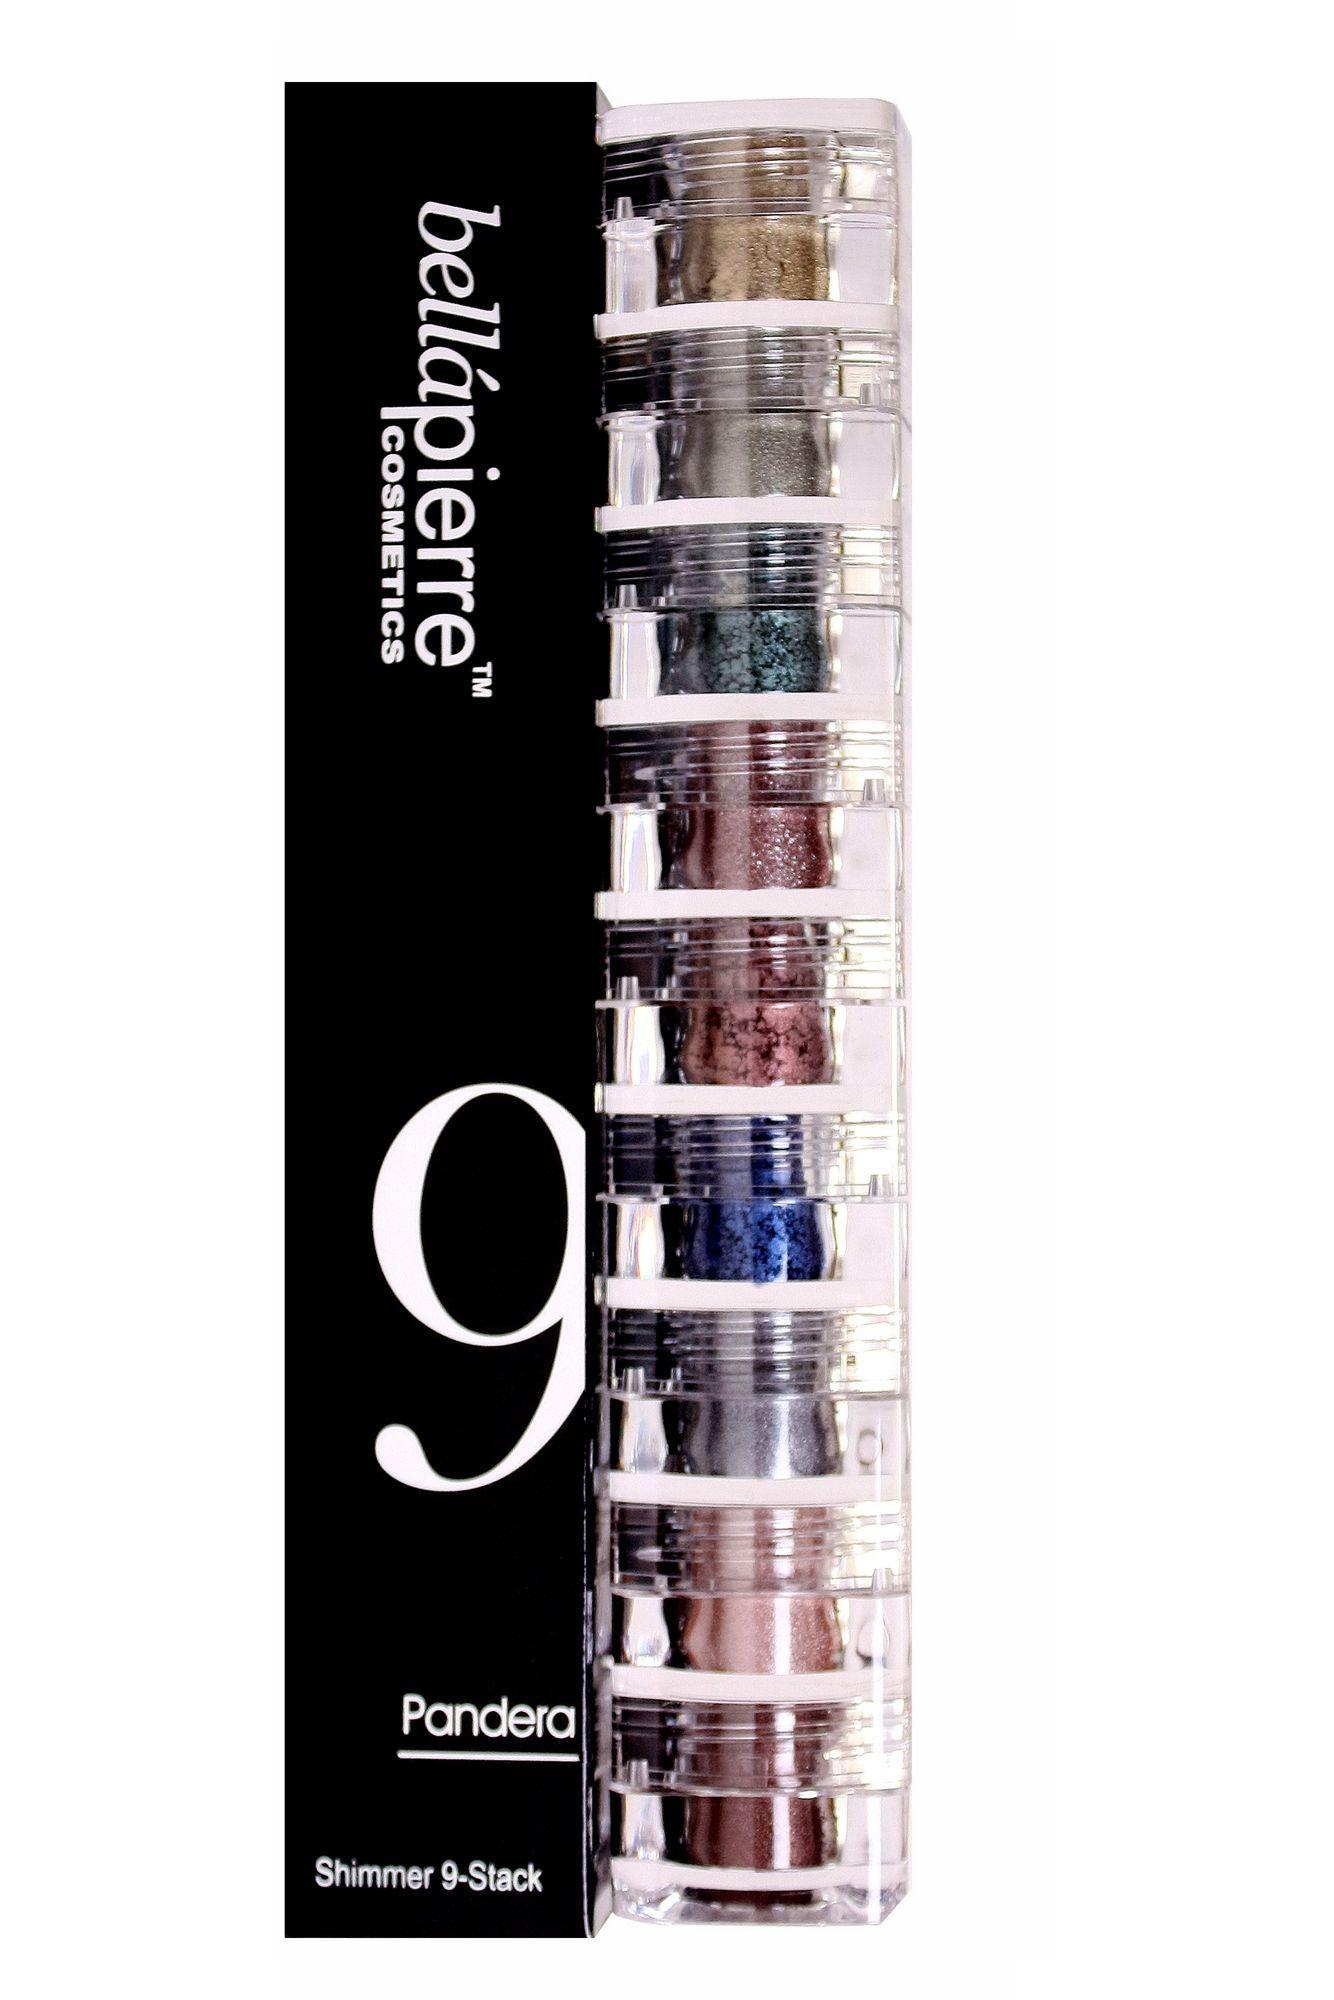 Bellapierre Shimmer 9Stack, Pandera Multi style